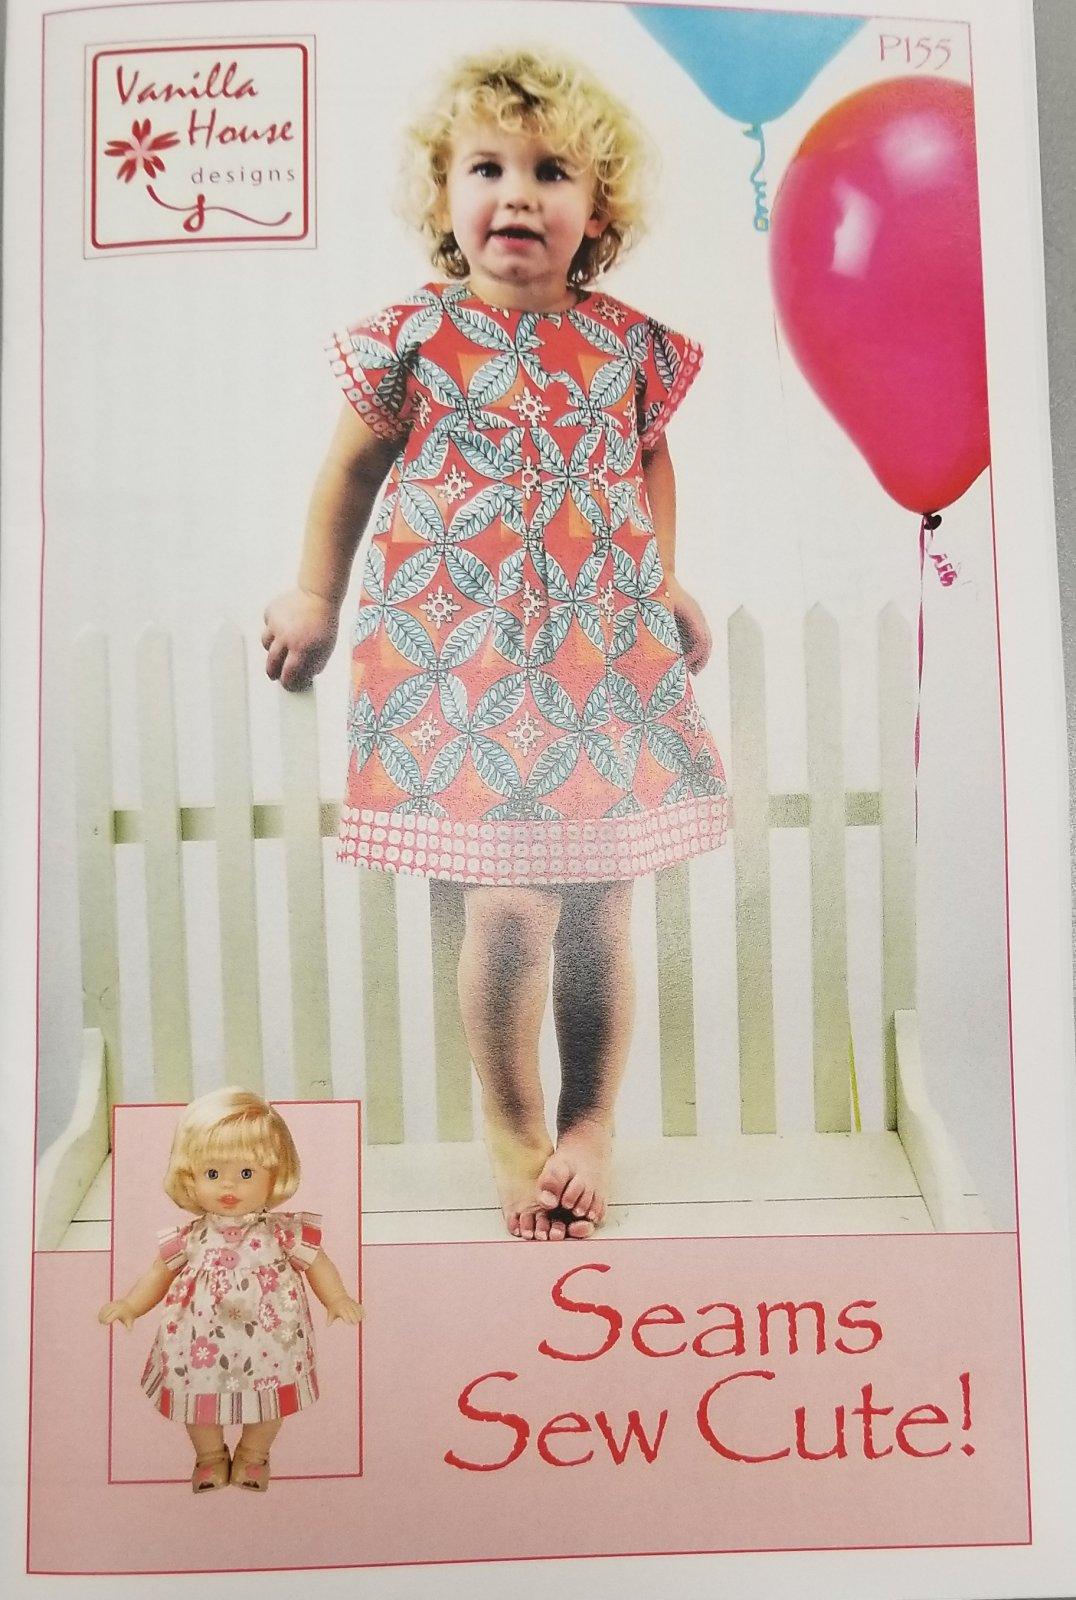 Seams Sew Cute!